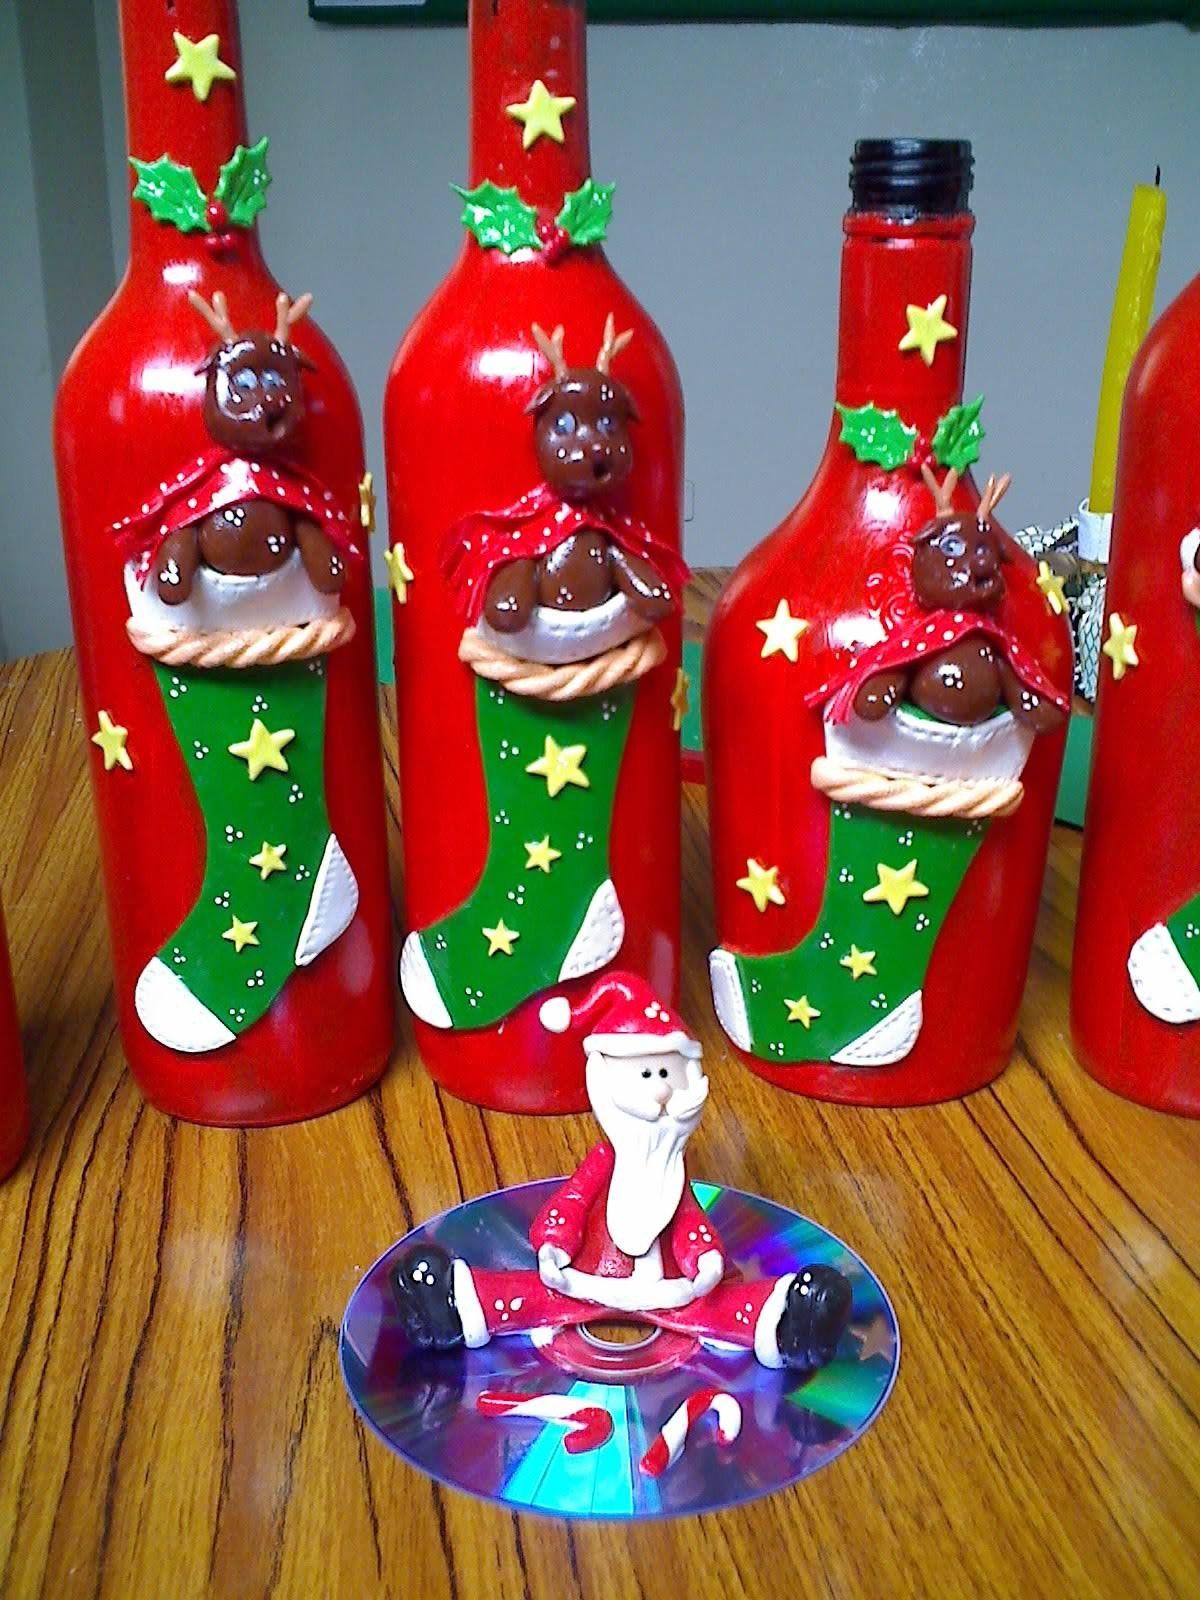 Lamparas con venecitas paso a paso buscar con google for Botellas de vidrio decoradas para navidad